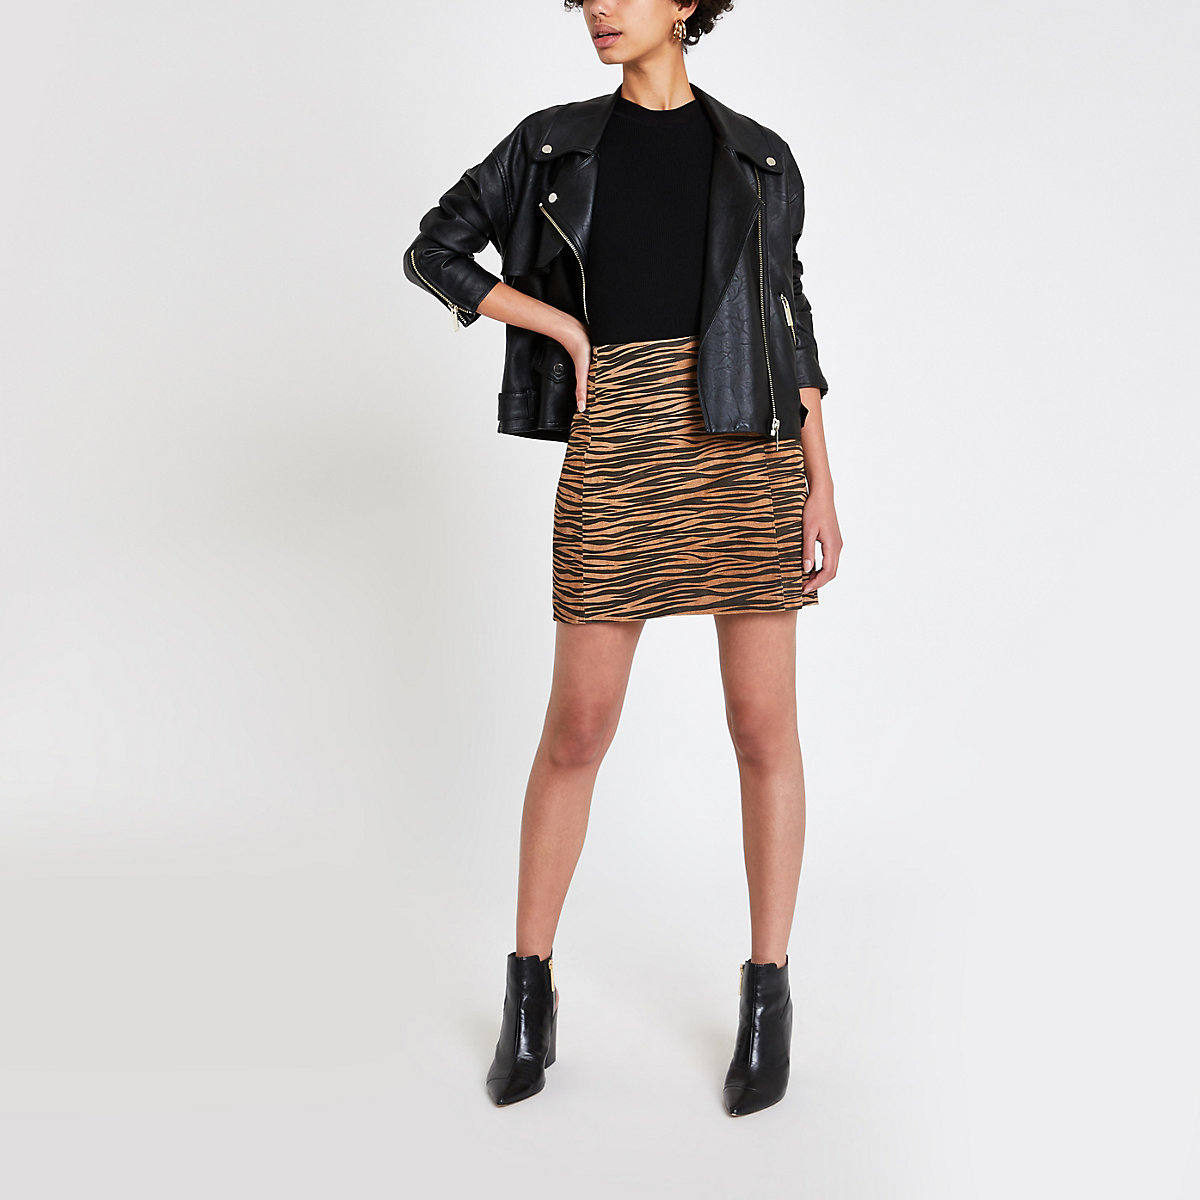 Brown suede tiger print mini skirt